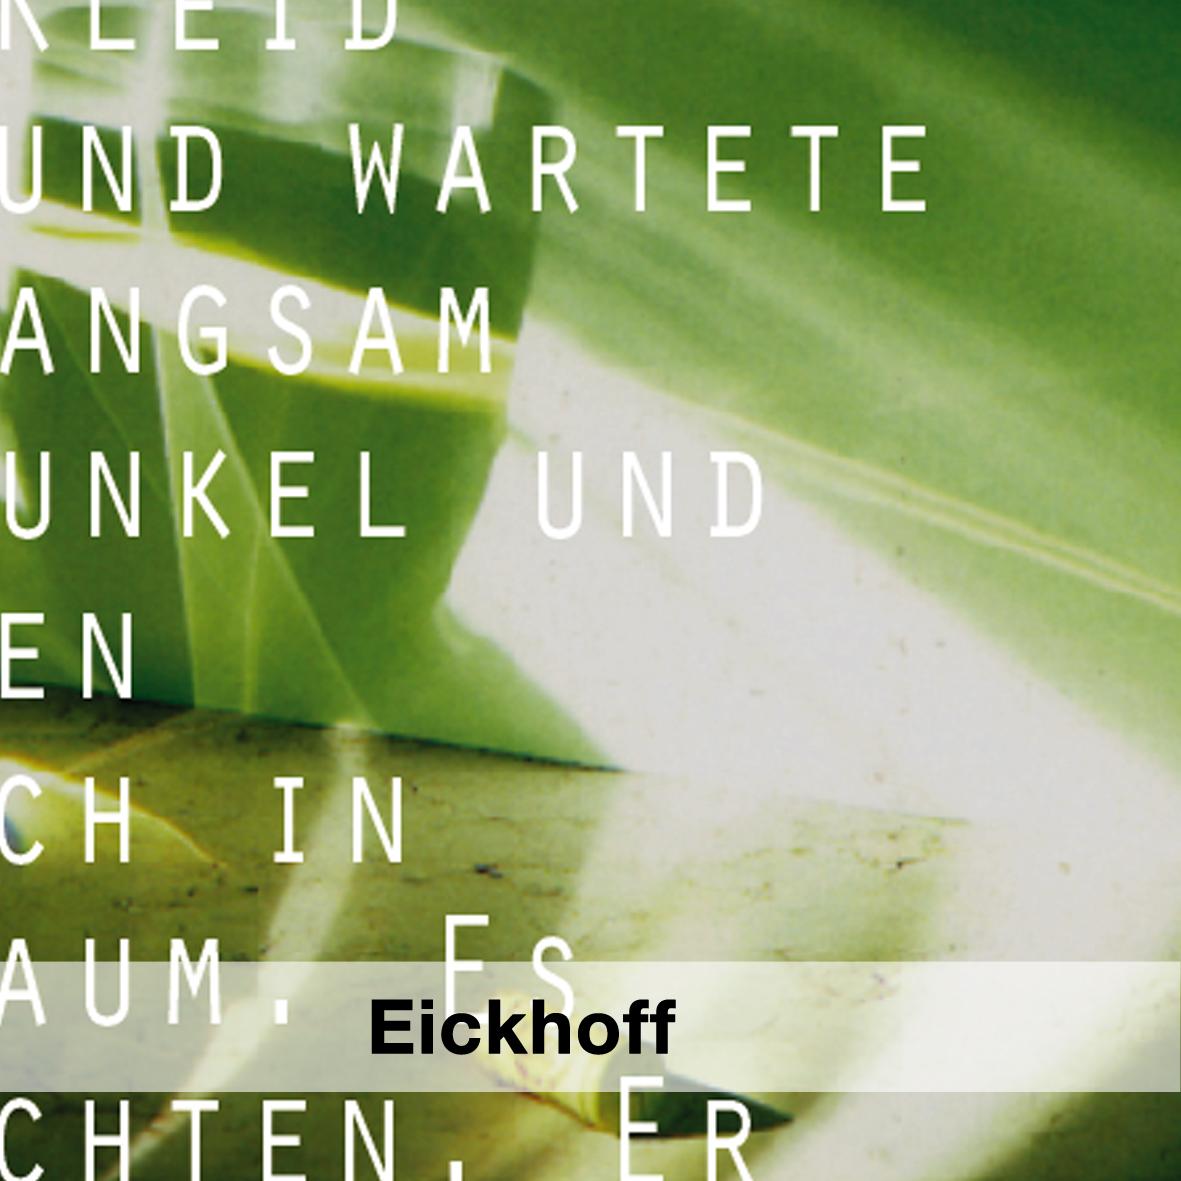 eickhoff.jpg